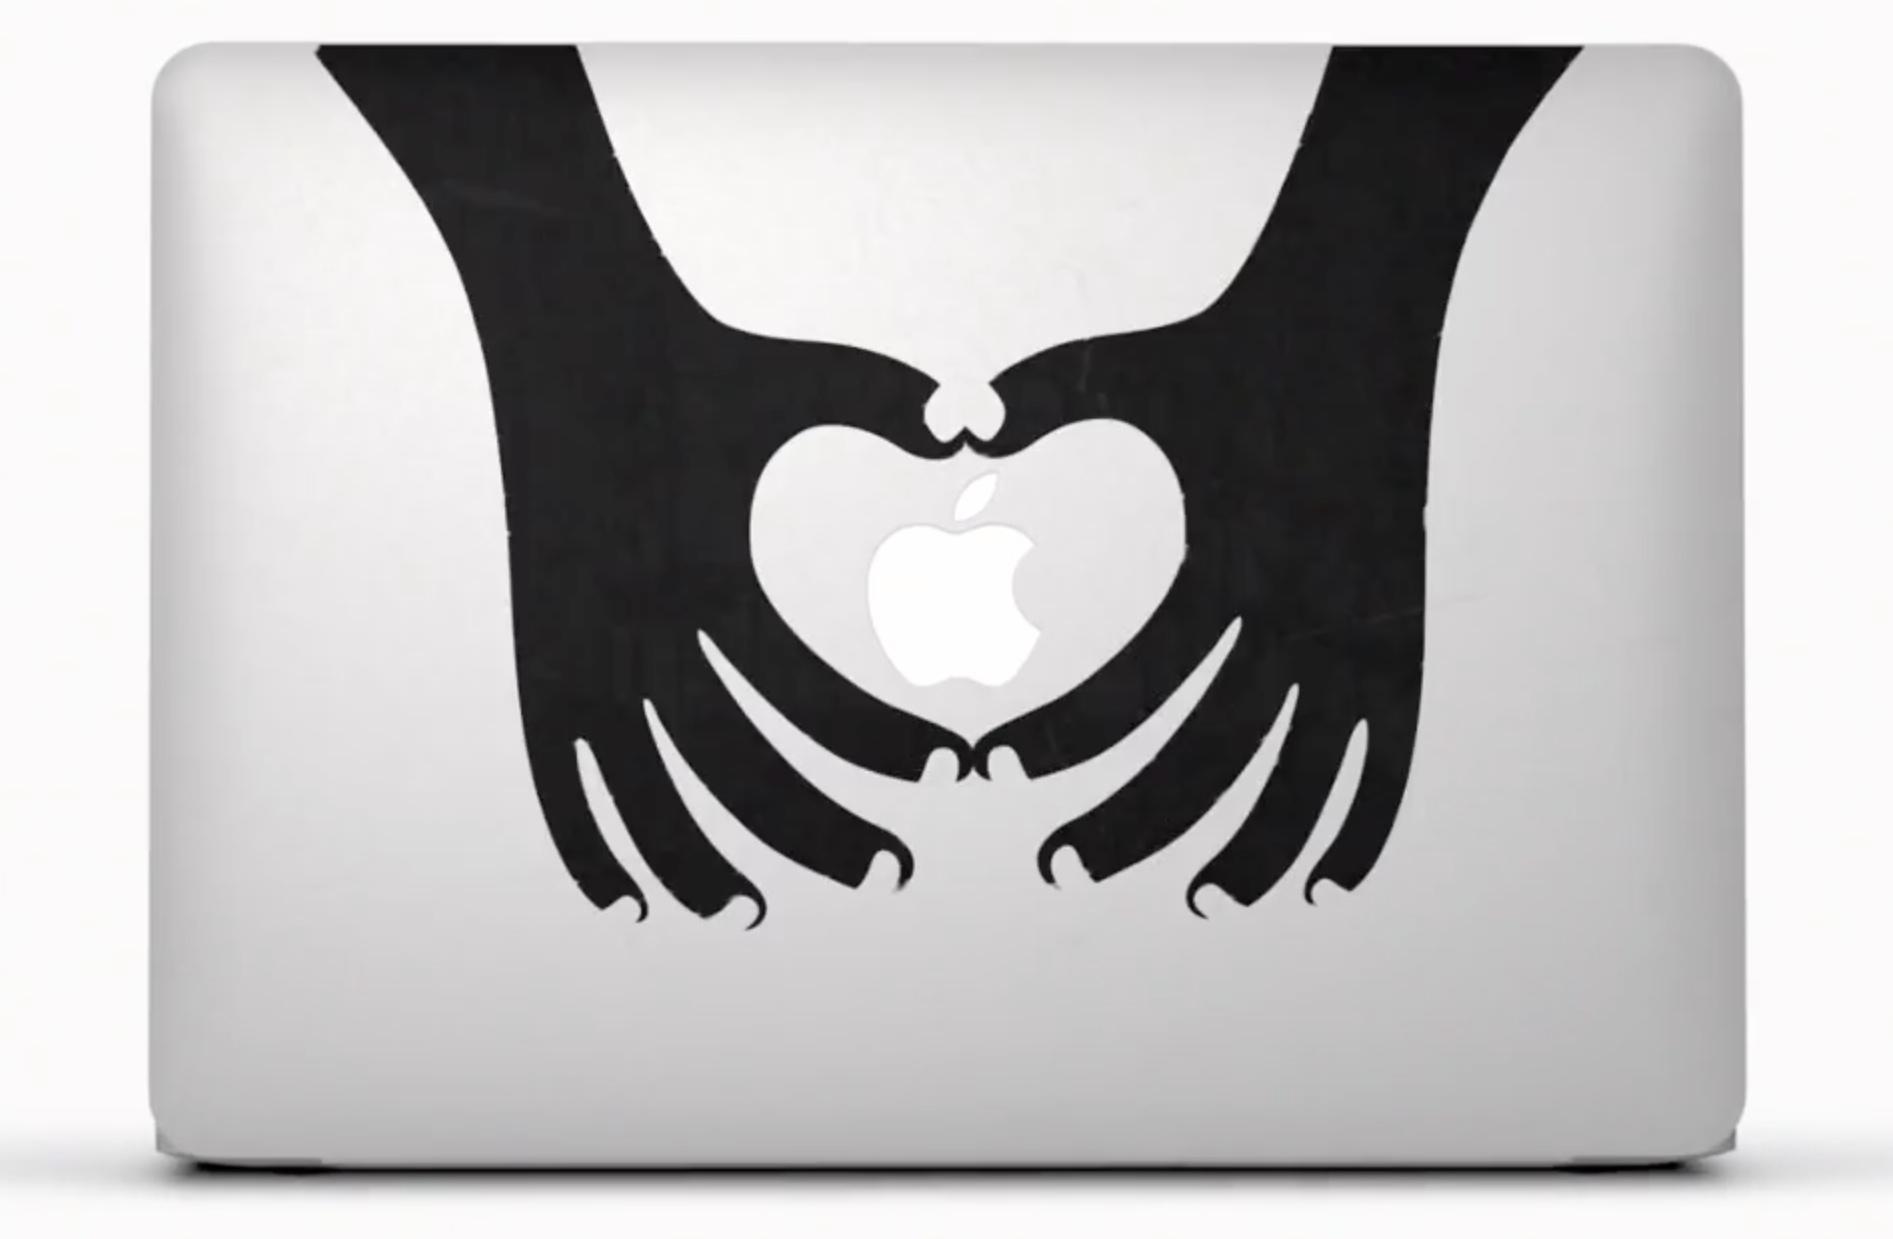 MacBook Air (stickers ad 001)